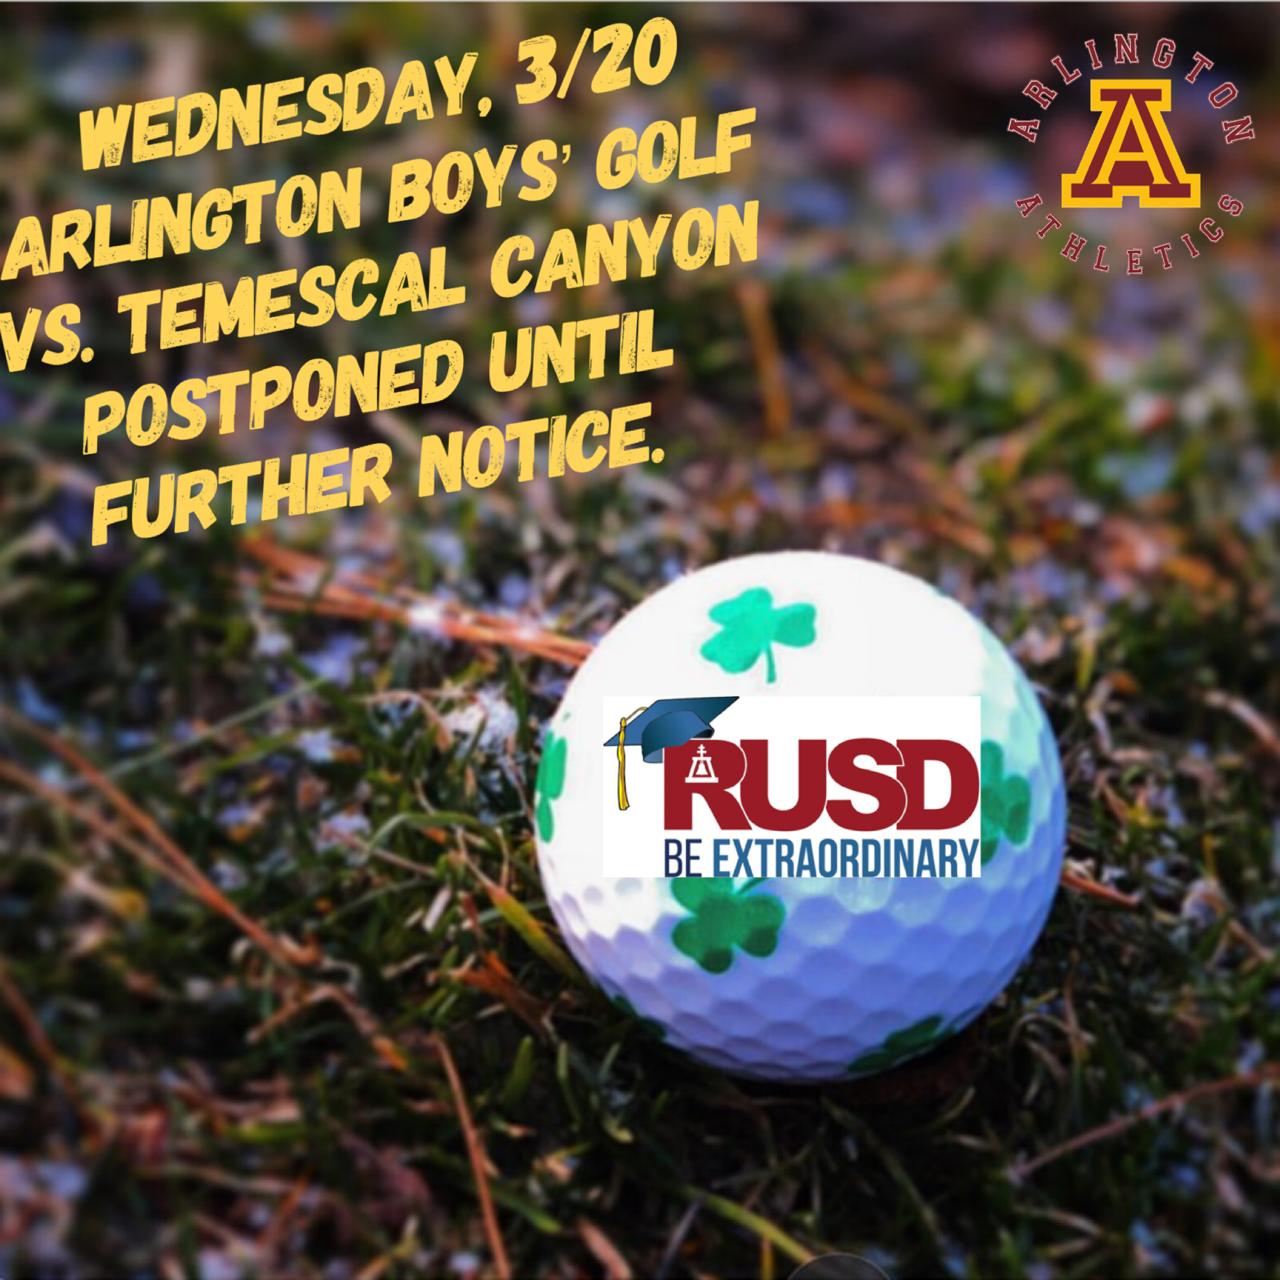 Wednesday, 3/20: Arlington Boys' Varsity Golf vs. Temescal Canyon – POSTPONED